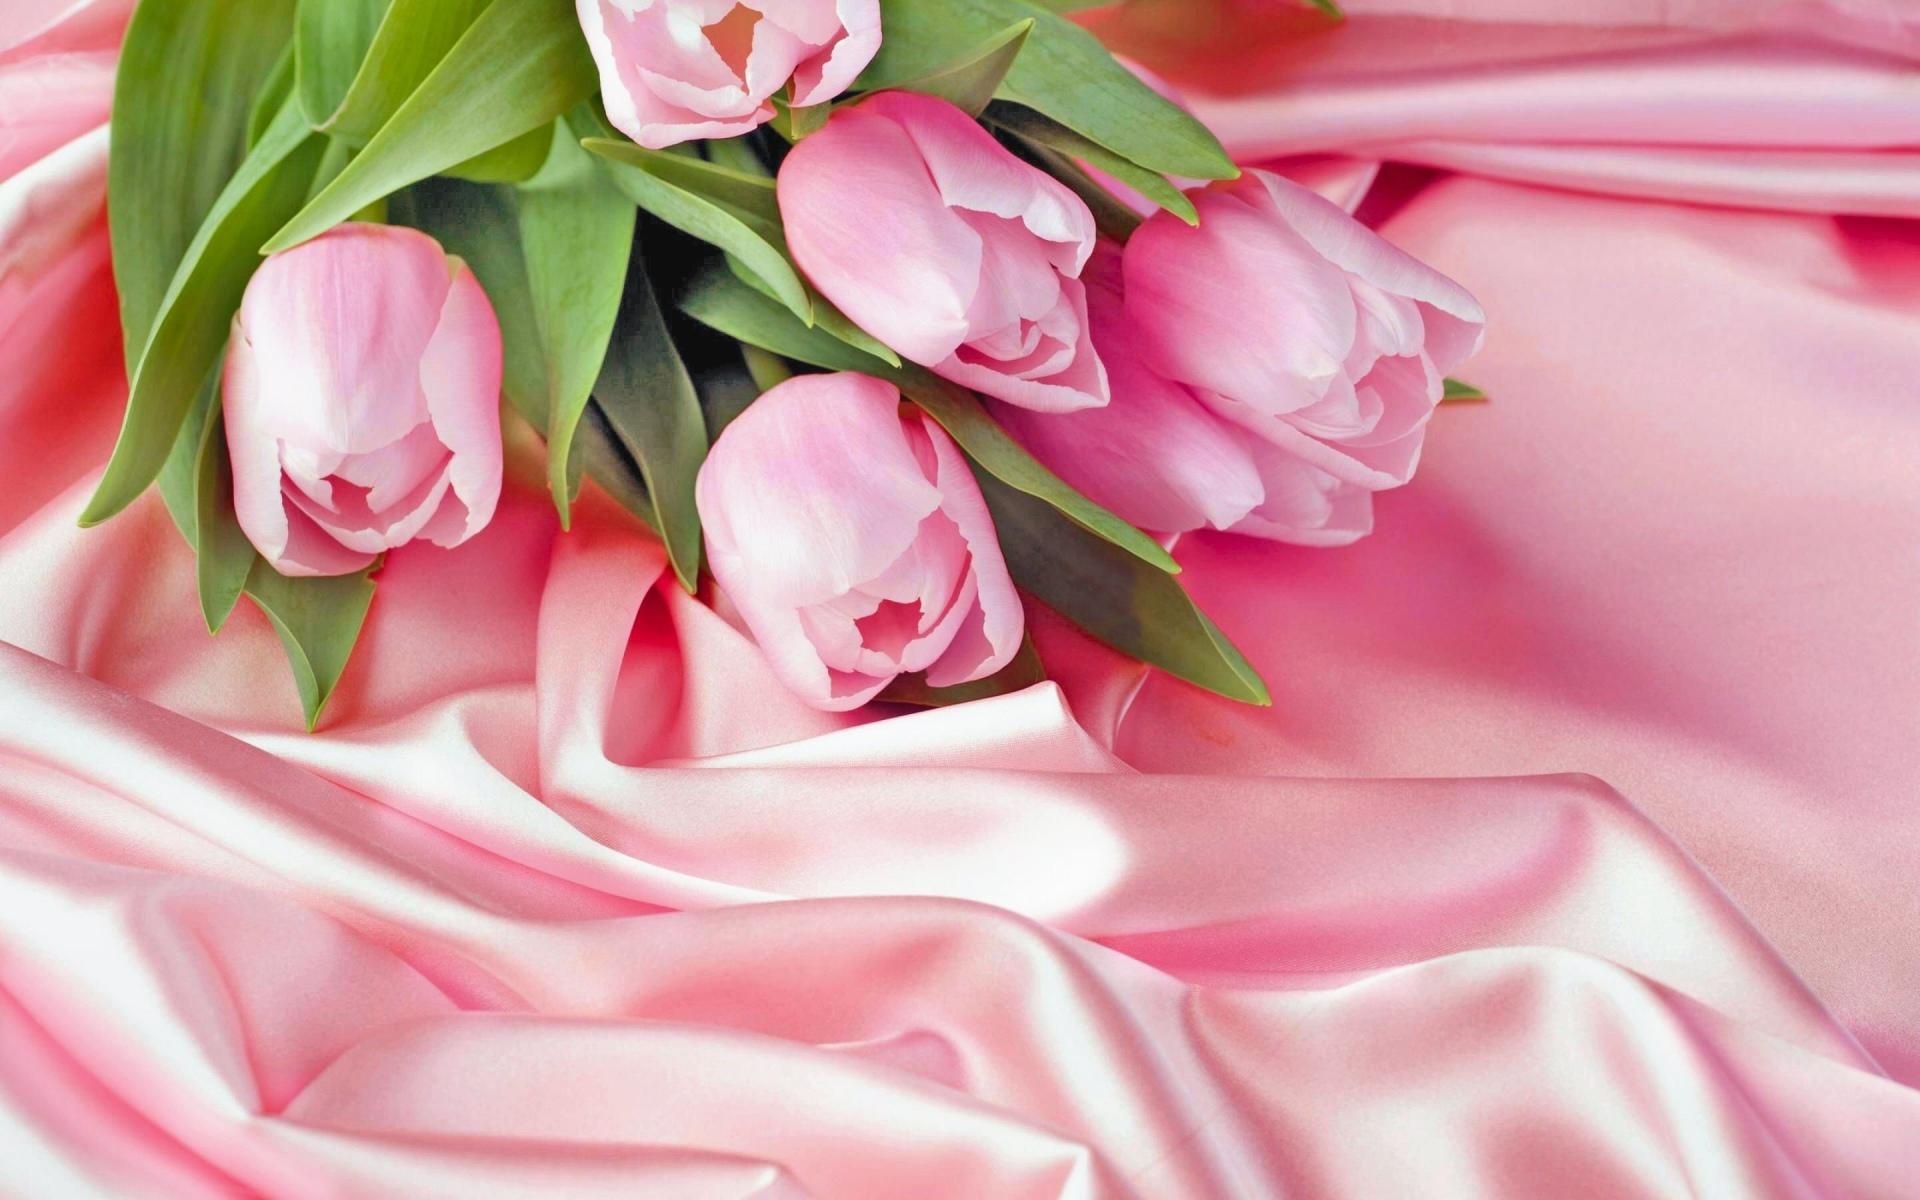 3d Hd Wallpapers Flowers Rose Fondos De Flores Wallpapers Hd Gratis